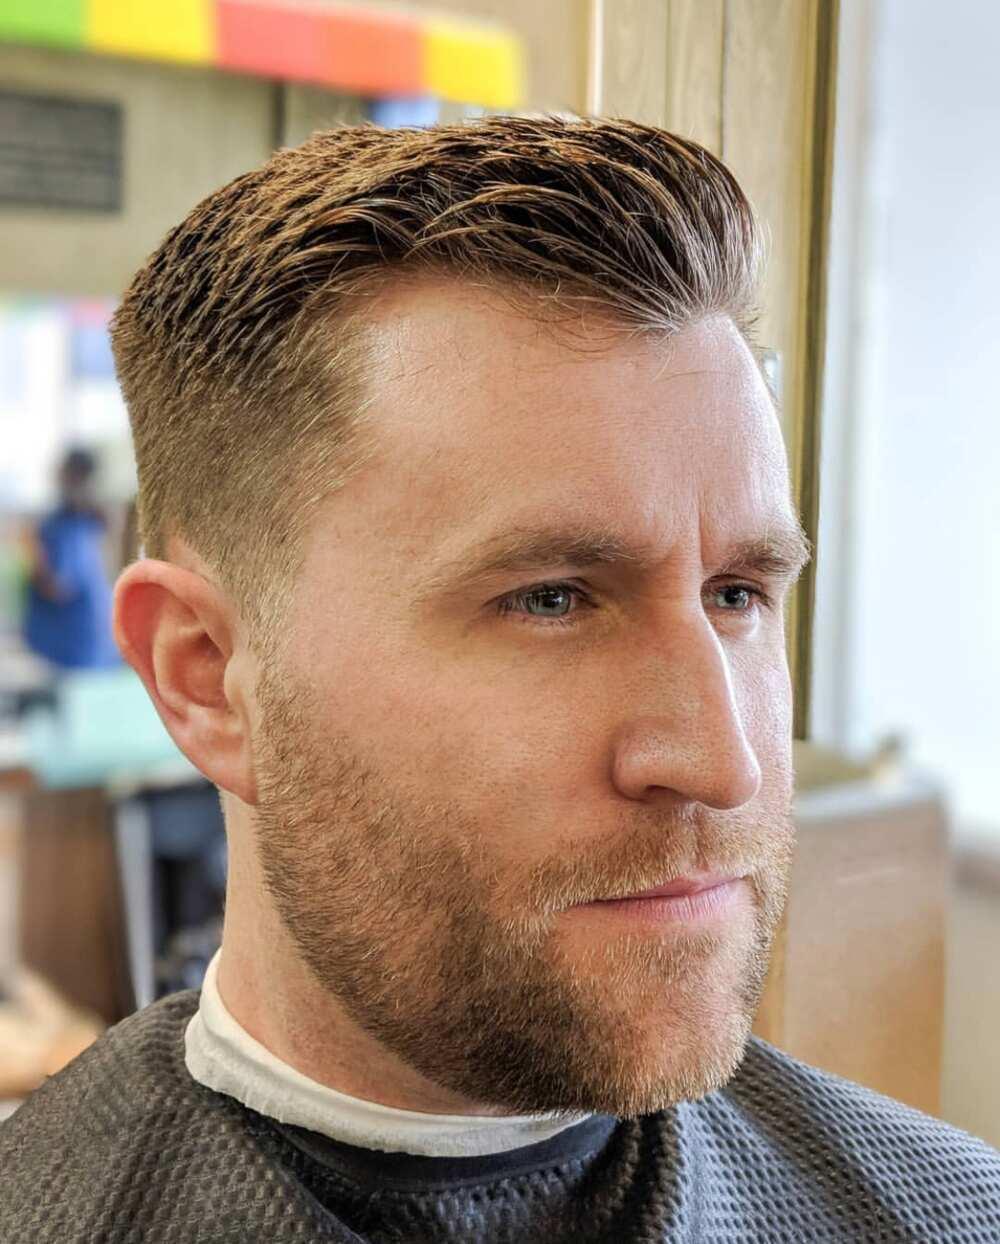 25 Ivy League Haircut Style Ideas For Men Legit Ng